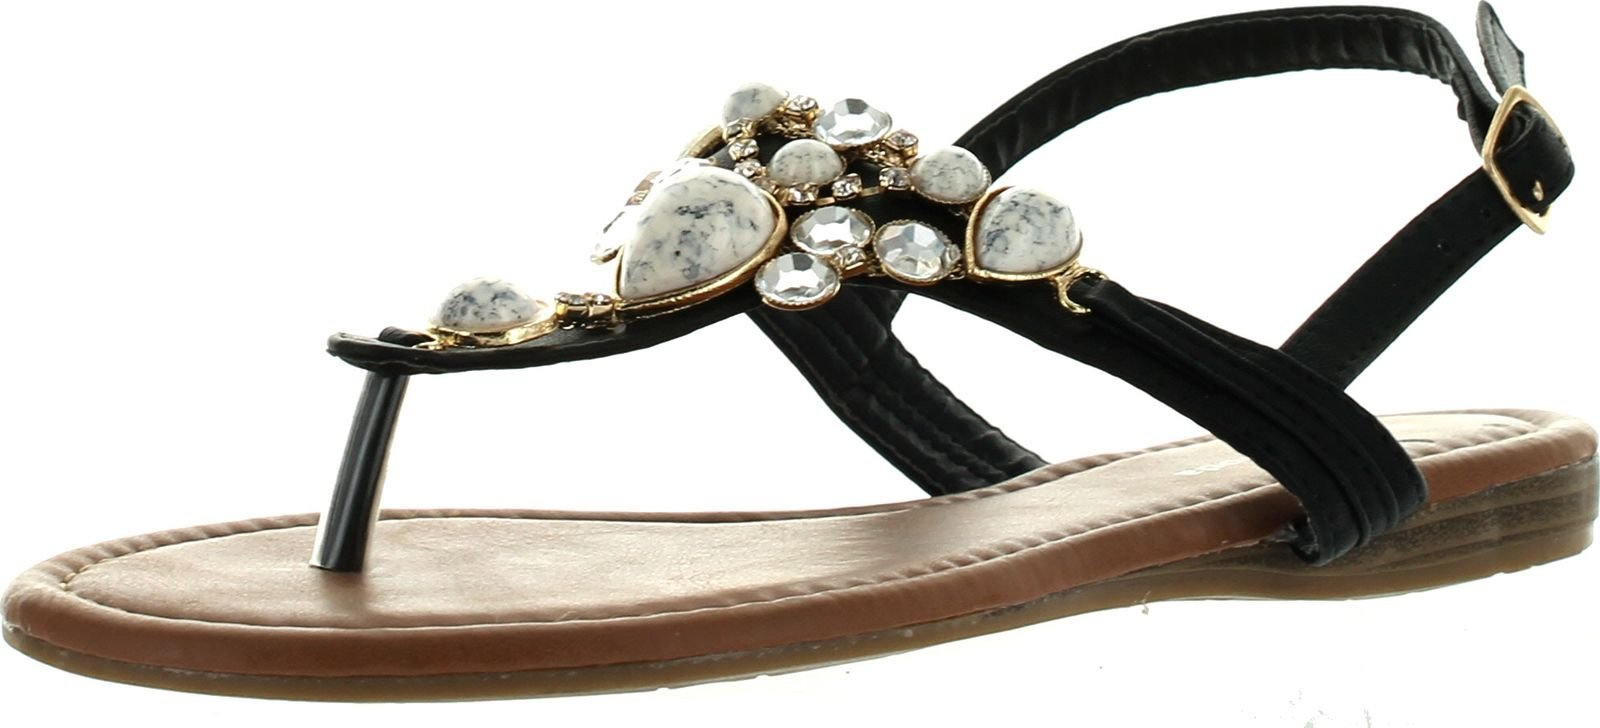 Top Moda Cb-6 Womens T-Strap Slim Strap Gemstone Buckle Flats Sandals,Black,8.5